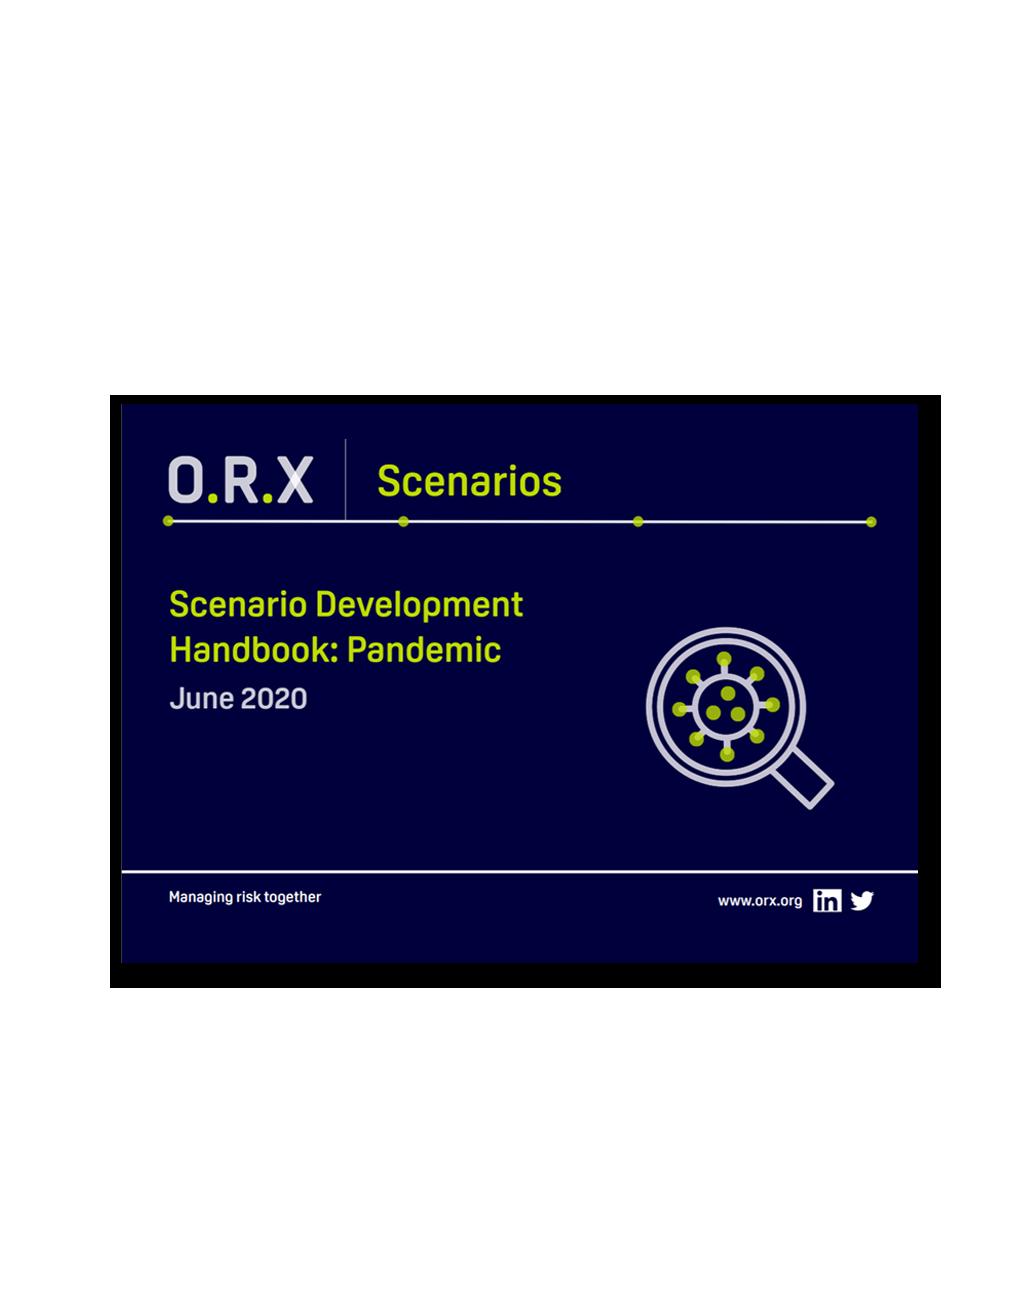 ORX_scenario pandemic handbook transaparent